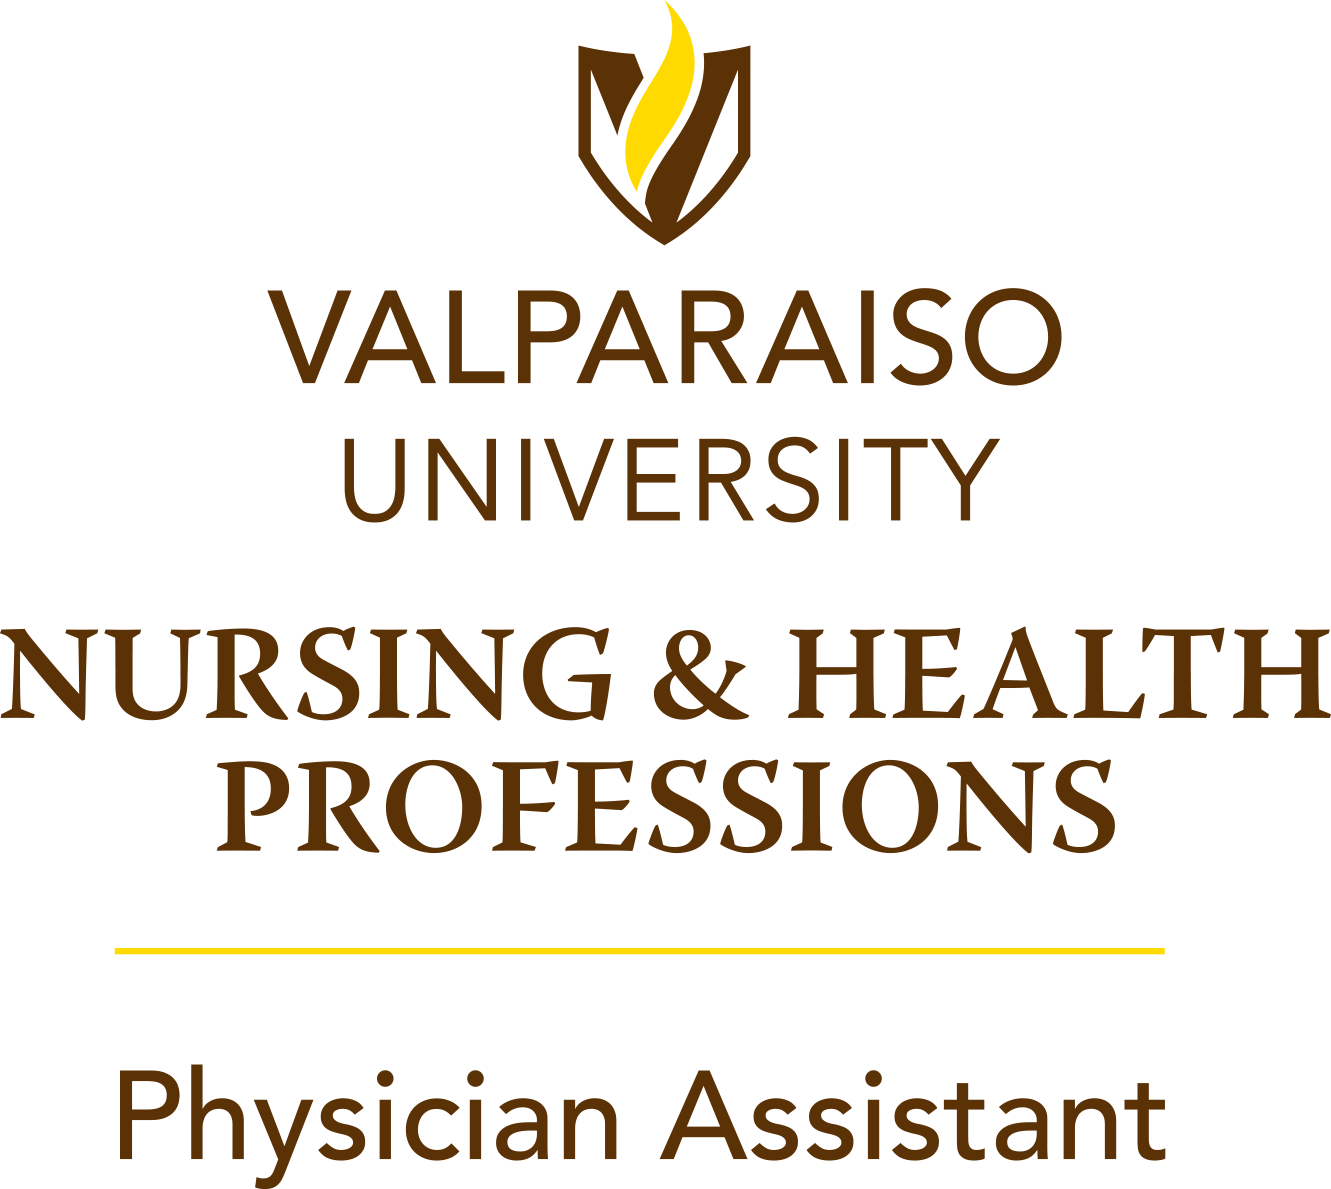 Valparaiso University Physician Assistant Program